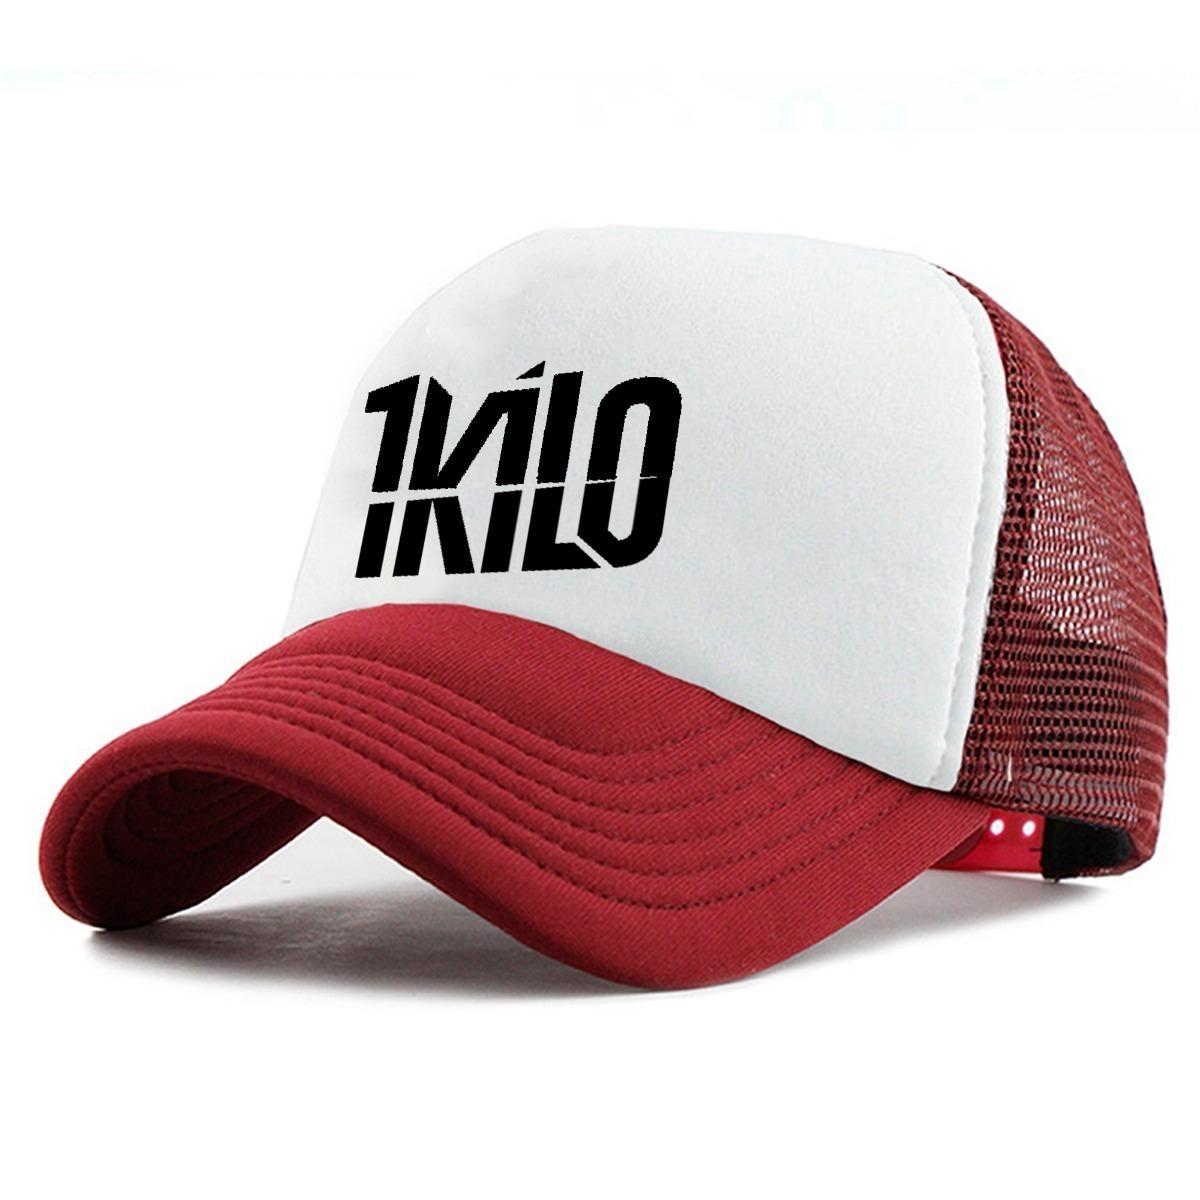 Boné Trucker Telinha 1kilo 1 Kilo Rap Swag Hip Hop Bone Novo - R  29 ... 106d03c7b0f